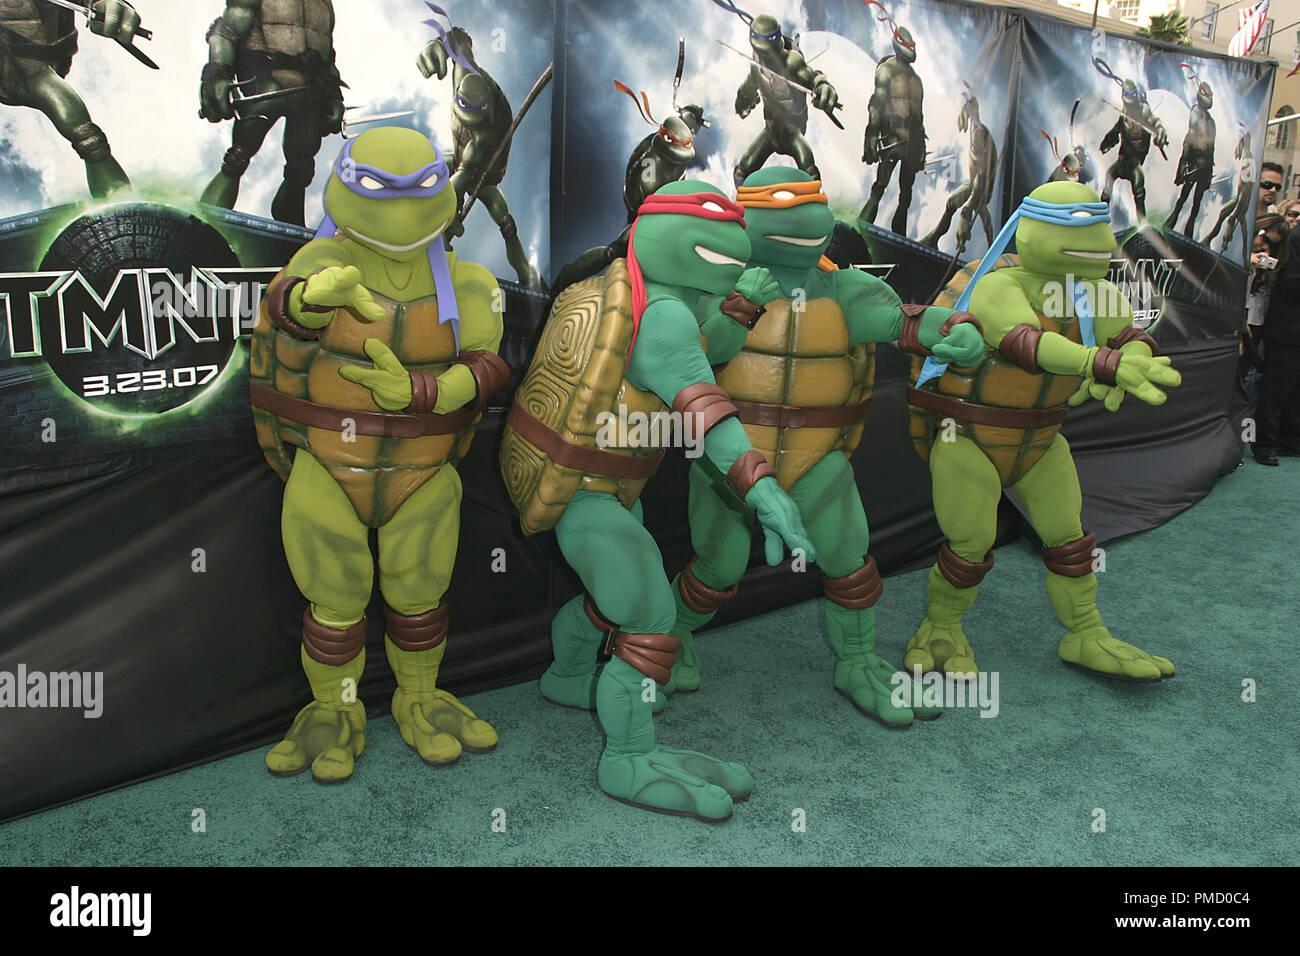 Teenage Mutant Ninja Turtles High Resolution Stock Photography And